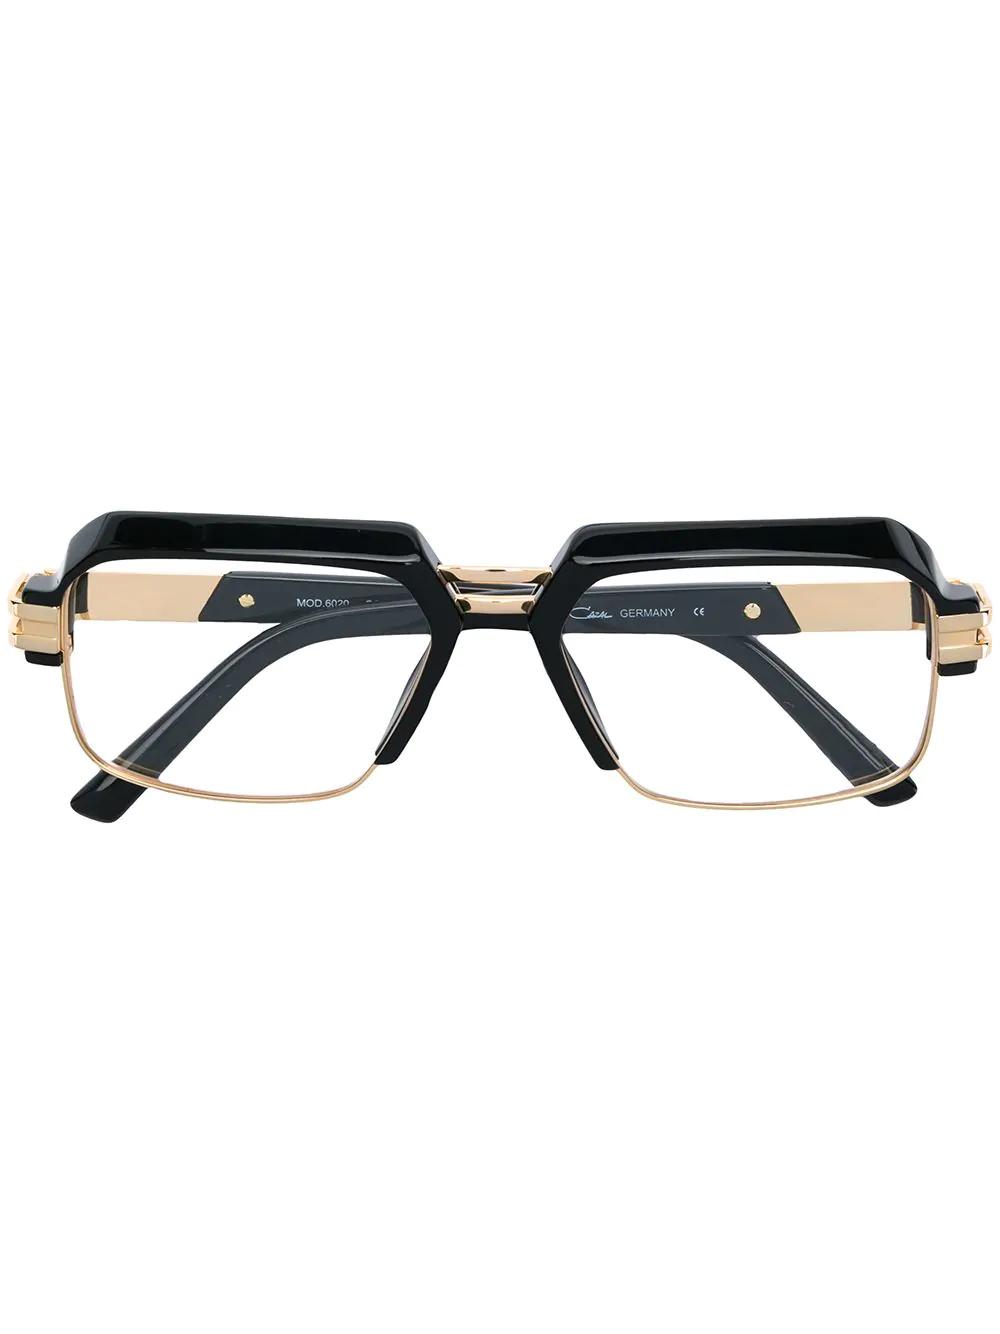 7f5f9a702085 Cazal Classic Square Glasses - Black | ModeSens